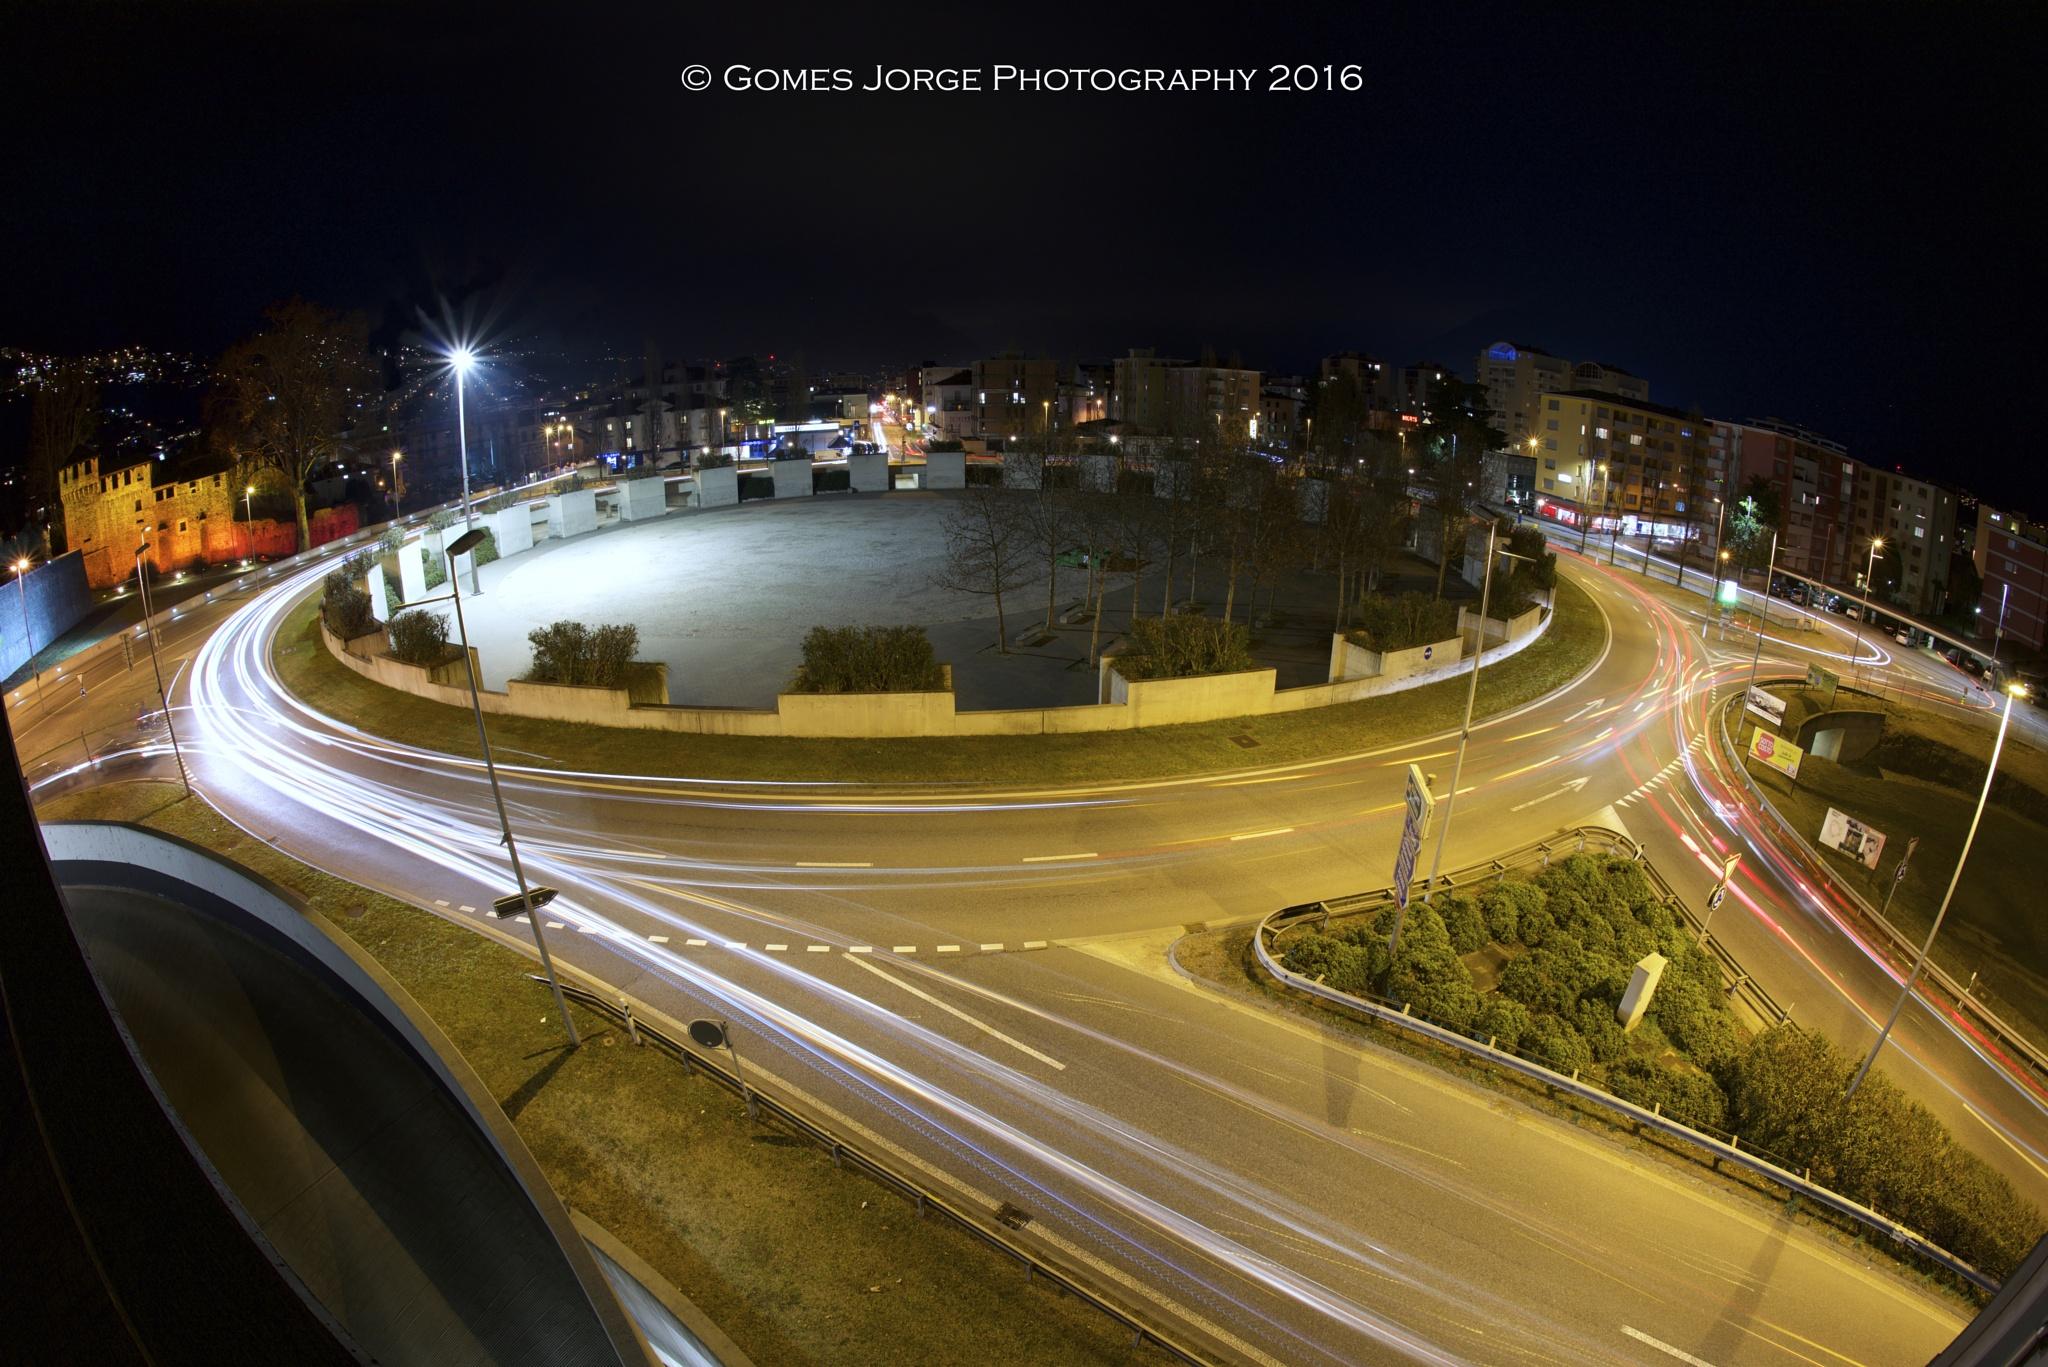 la rotonda by Gomes Jorge